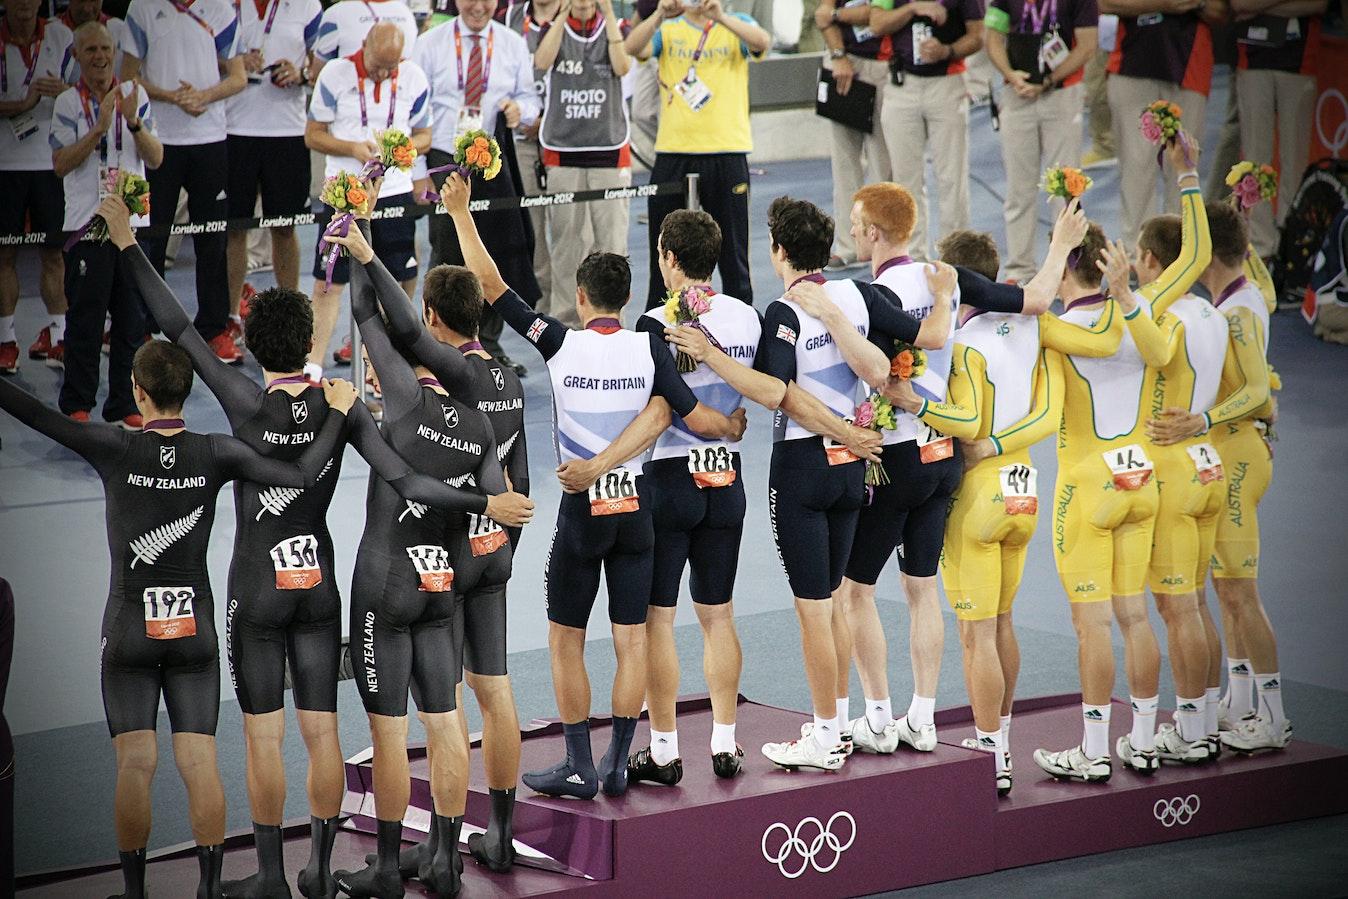 Three teams standing on an Olympics podium